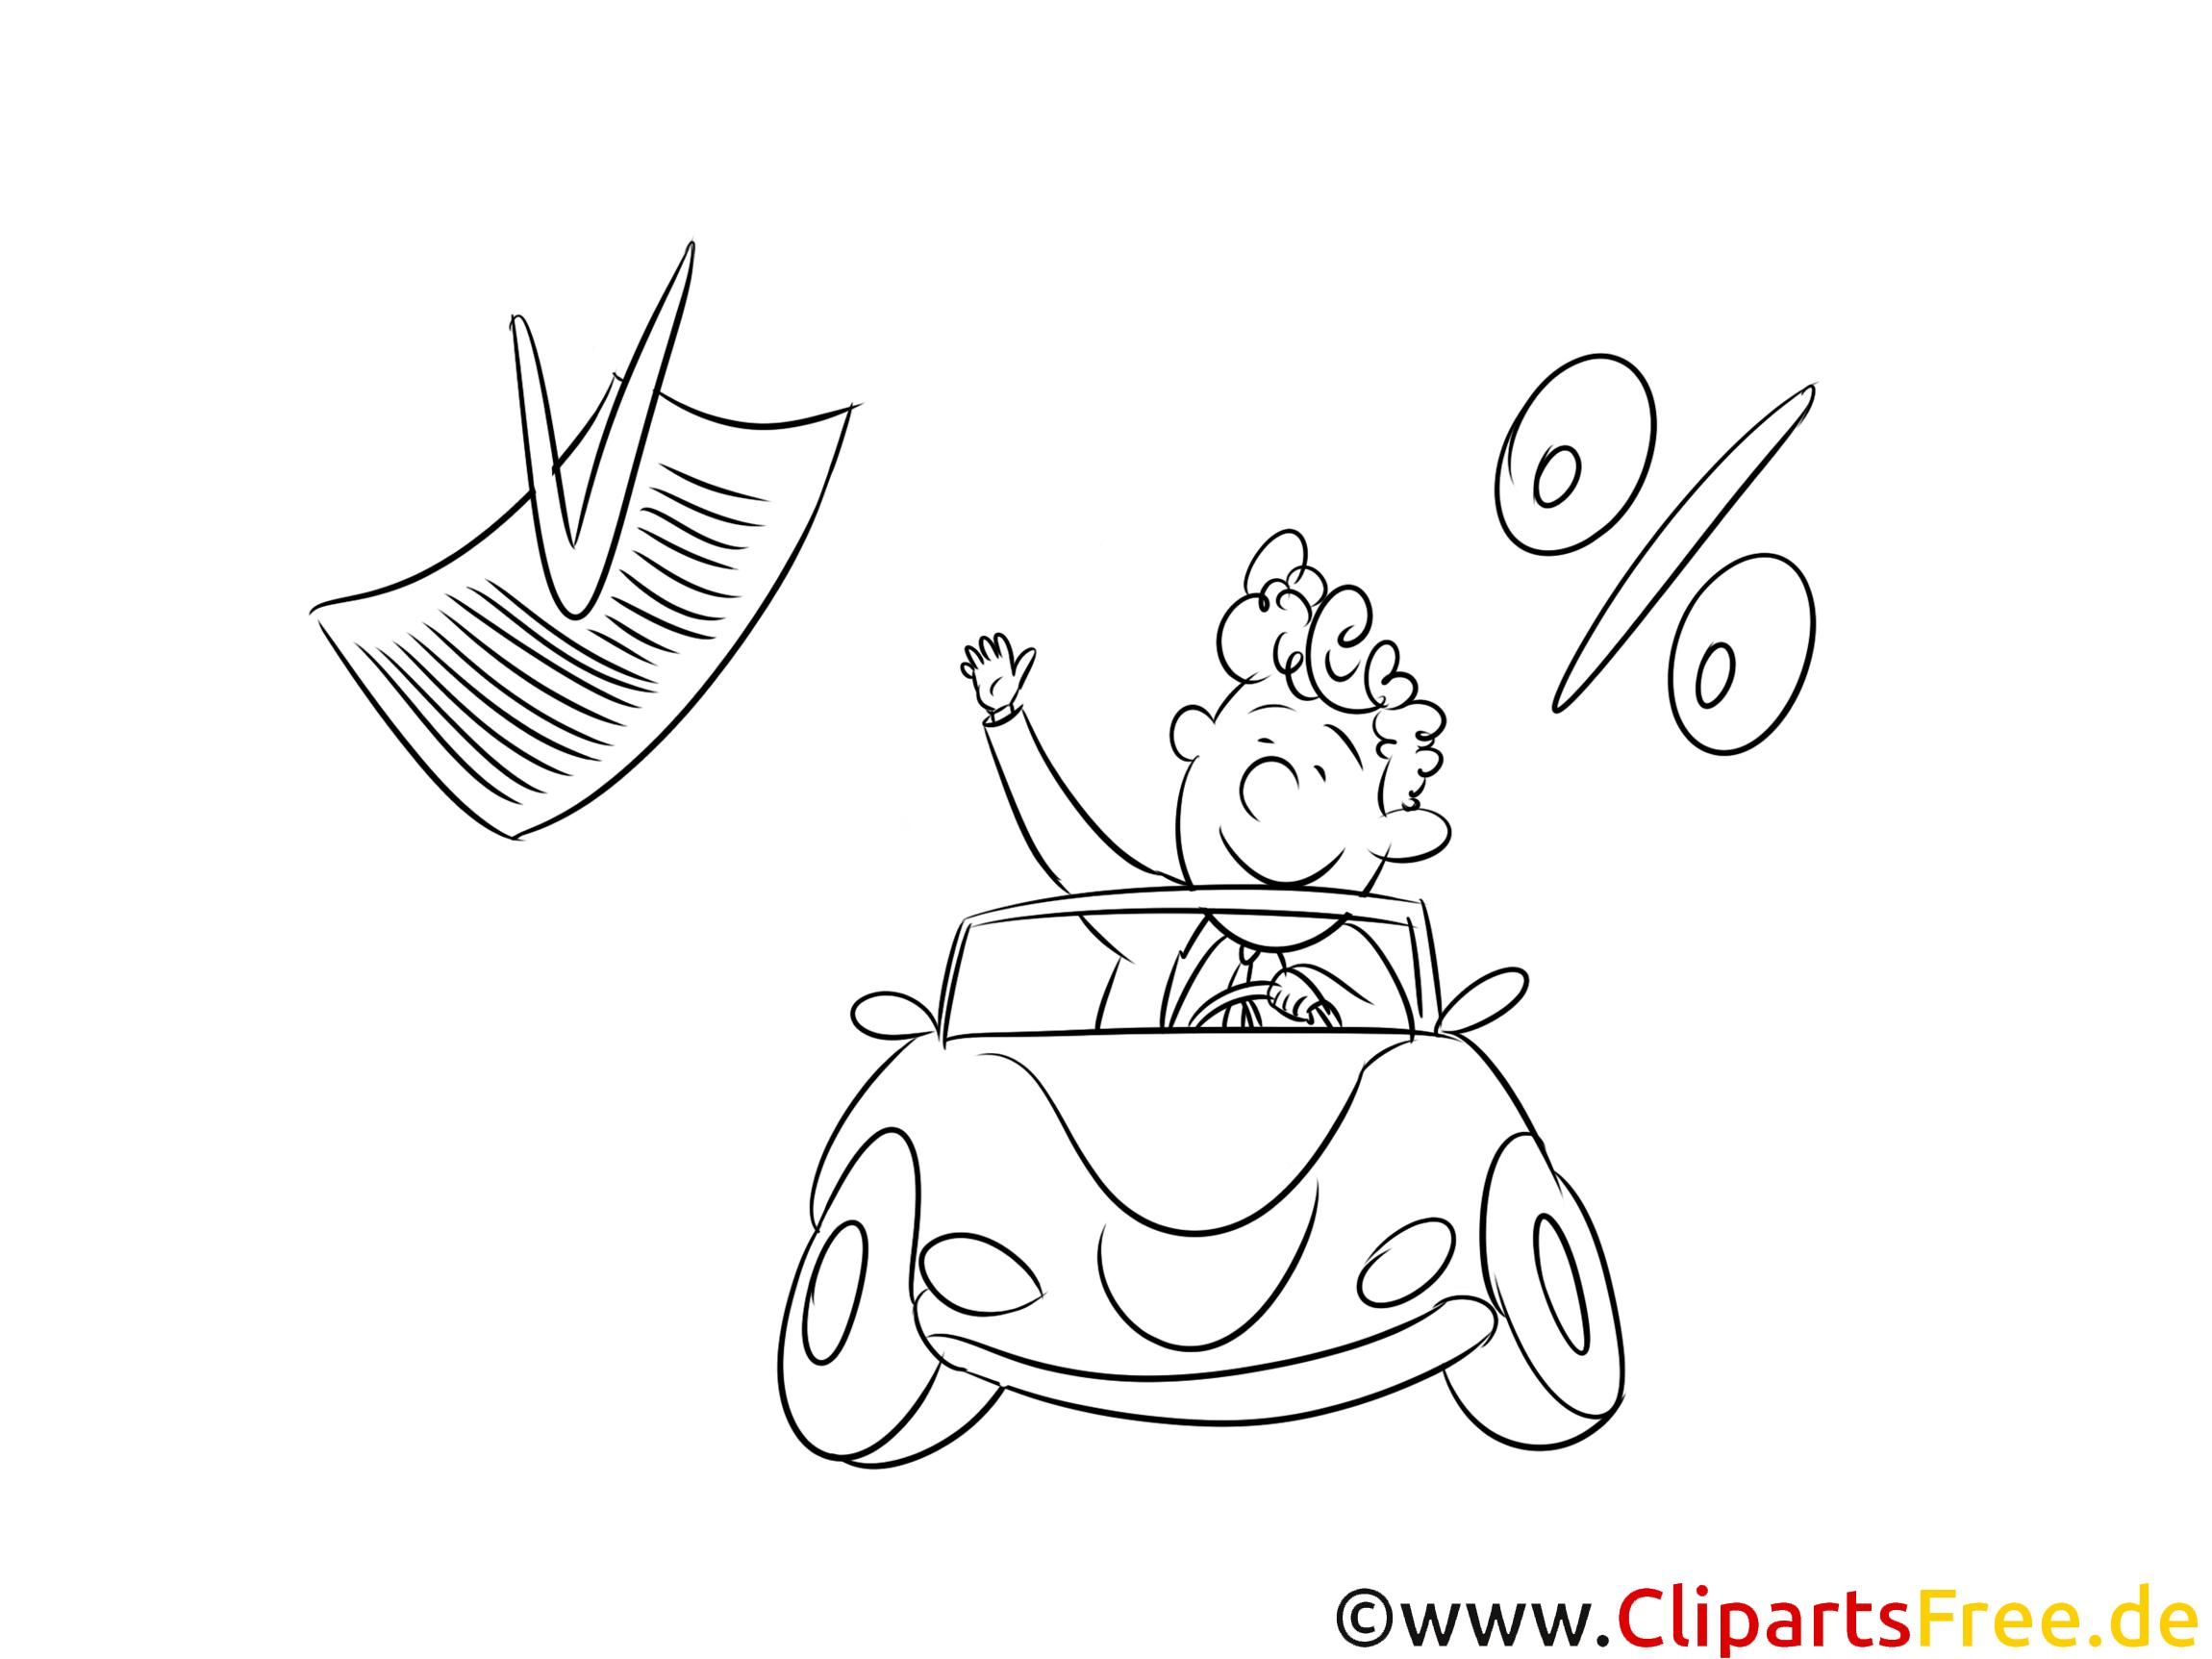 Finanzierung Auto Ausmalbild, Bild, Grafik, Illustration